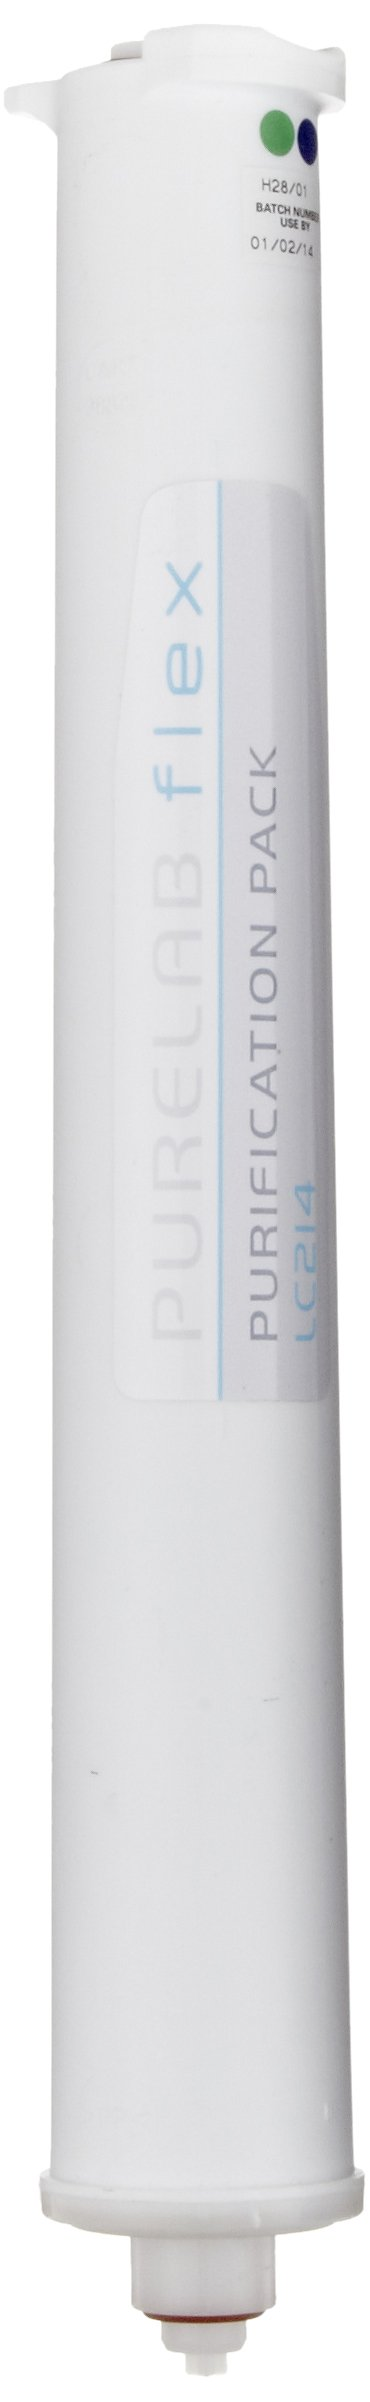 Elga LC214 Purification Cartridge, For Purelab Flex 3 and 4